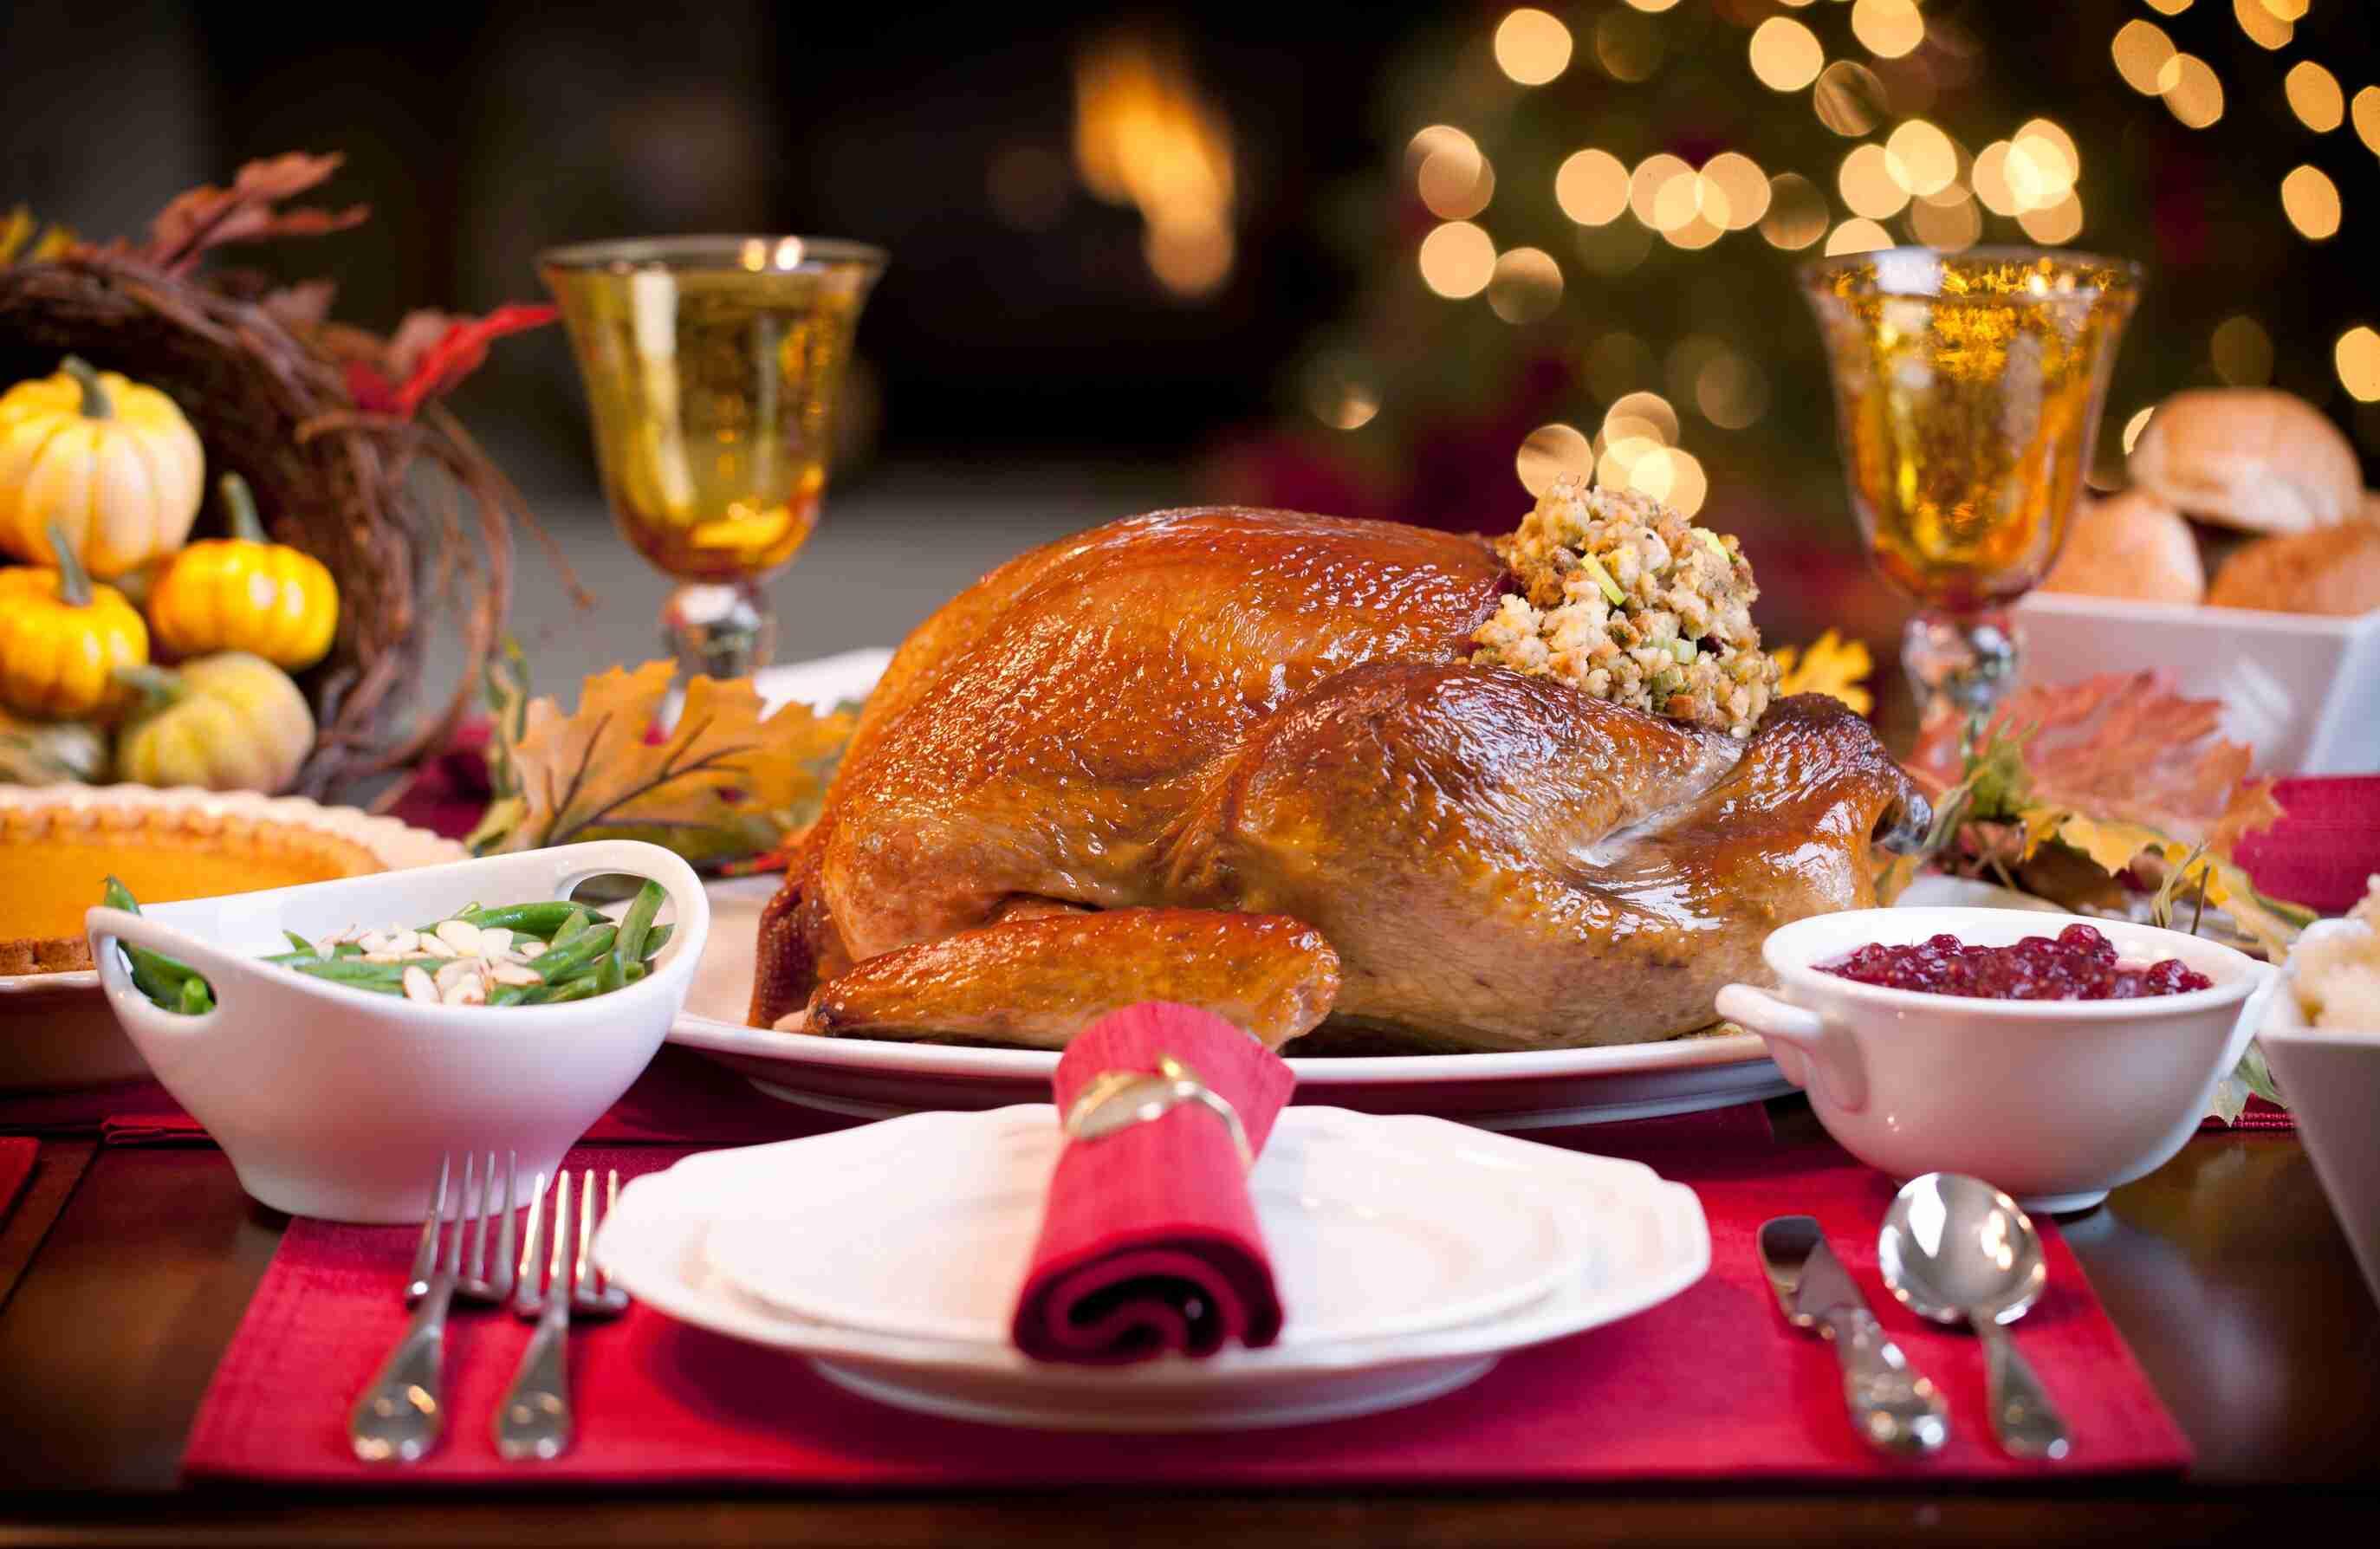 ThanksgivingTable.jpg